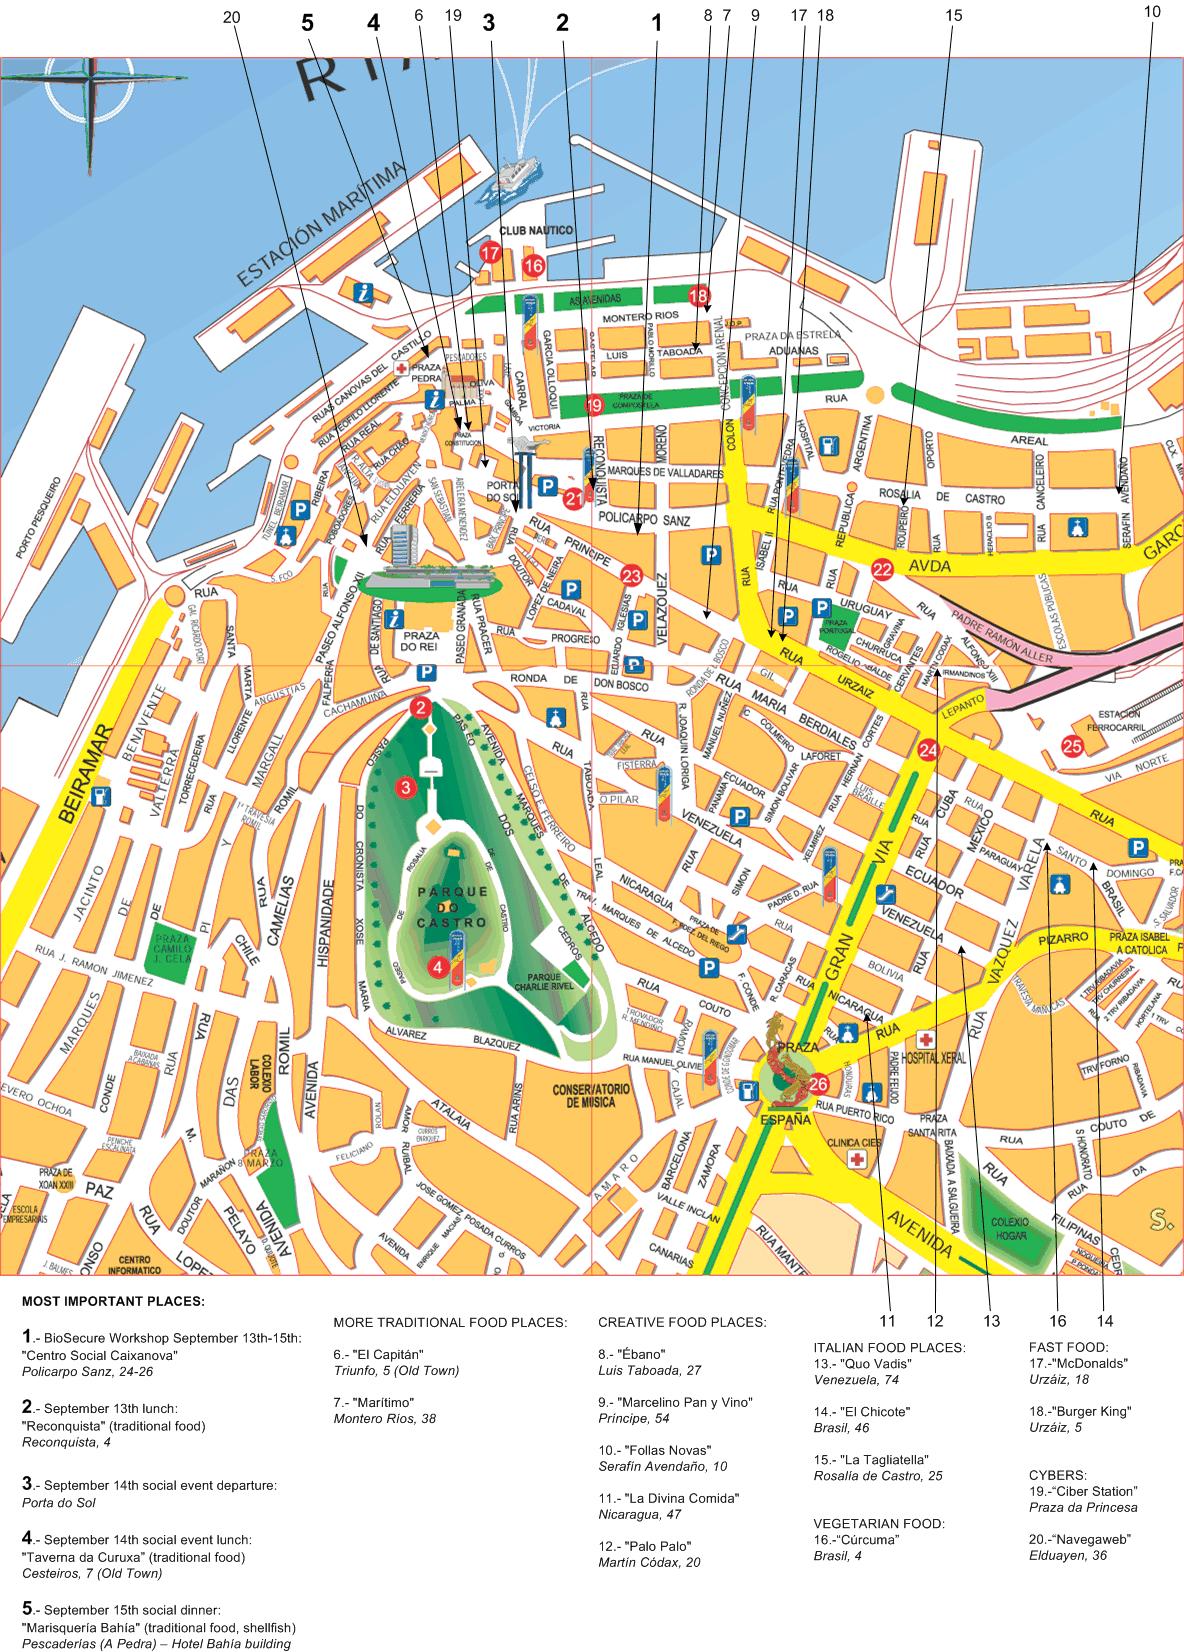 Mapa turístico de Vigo